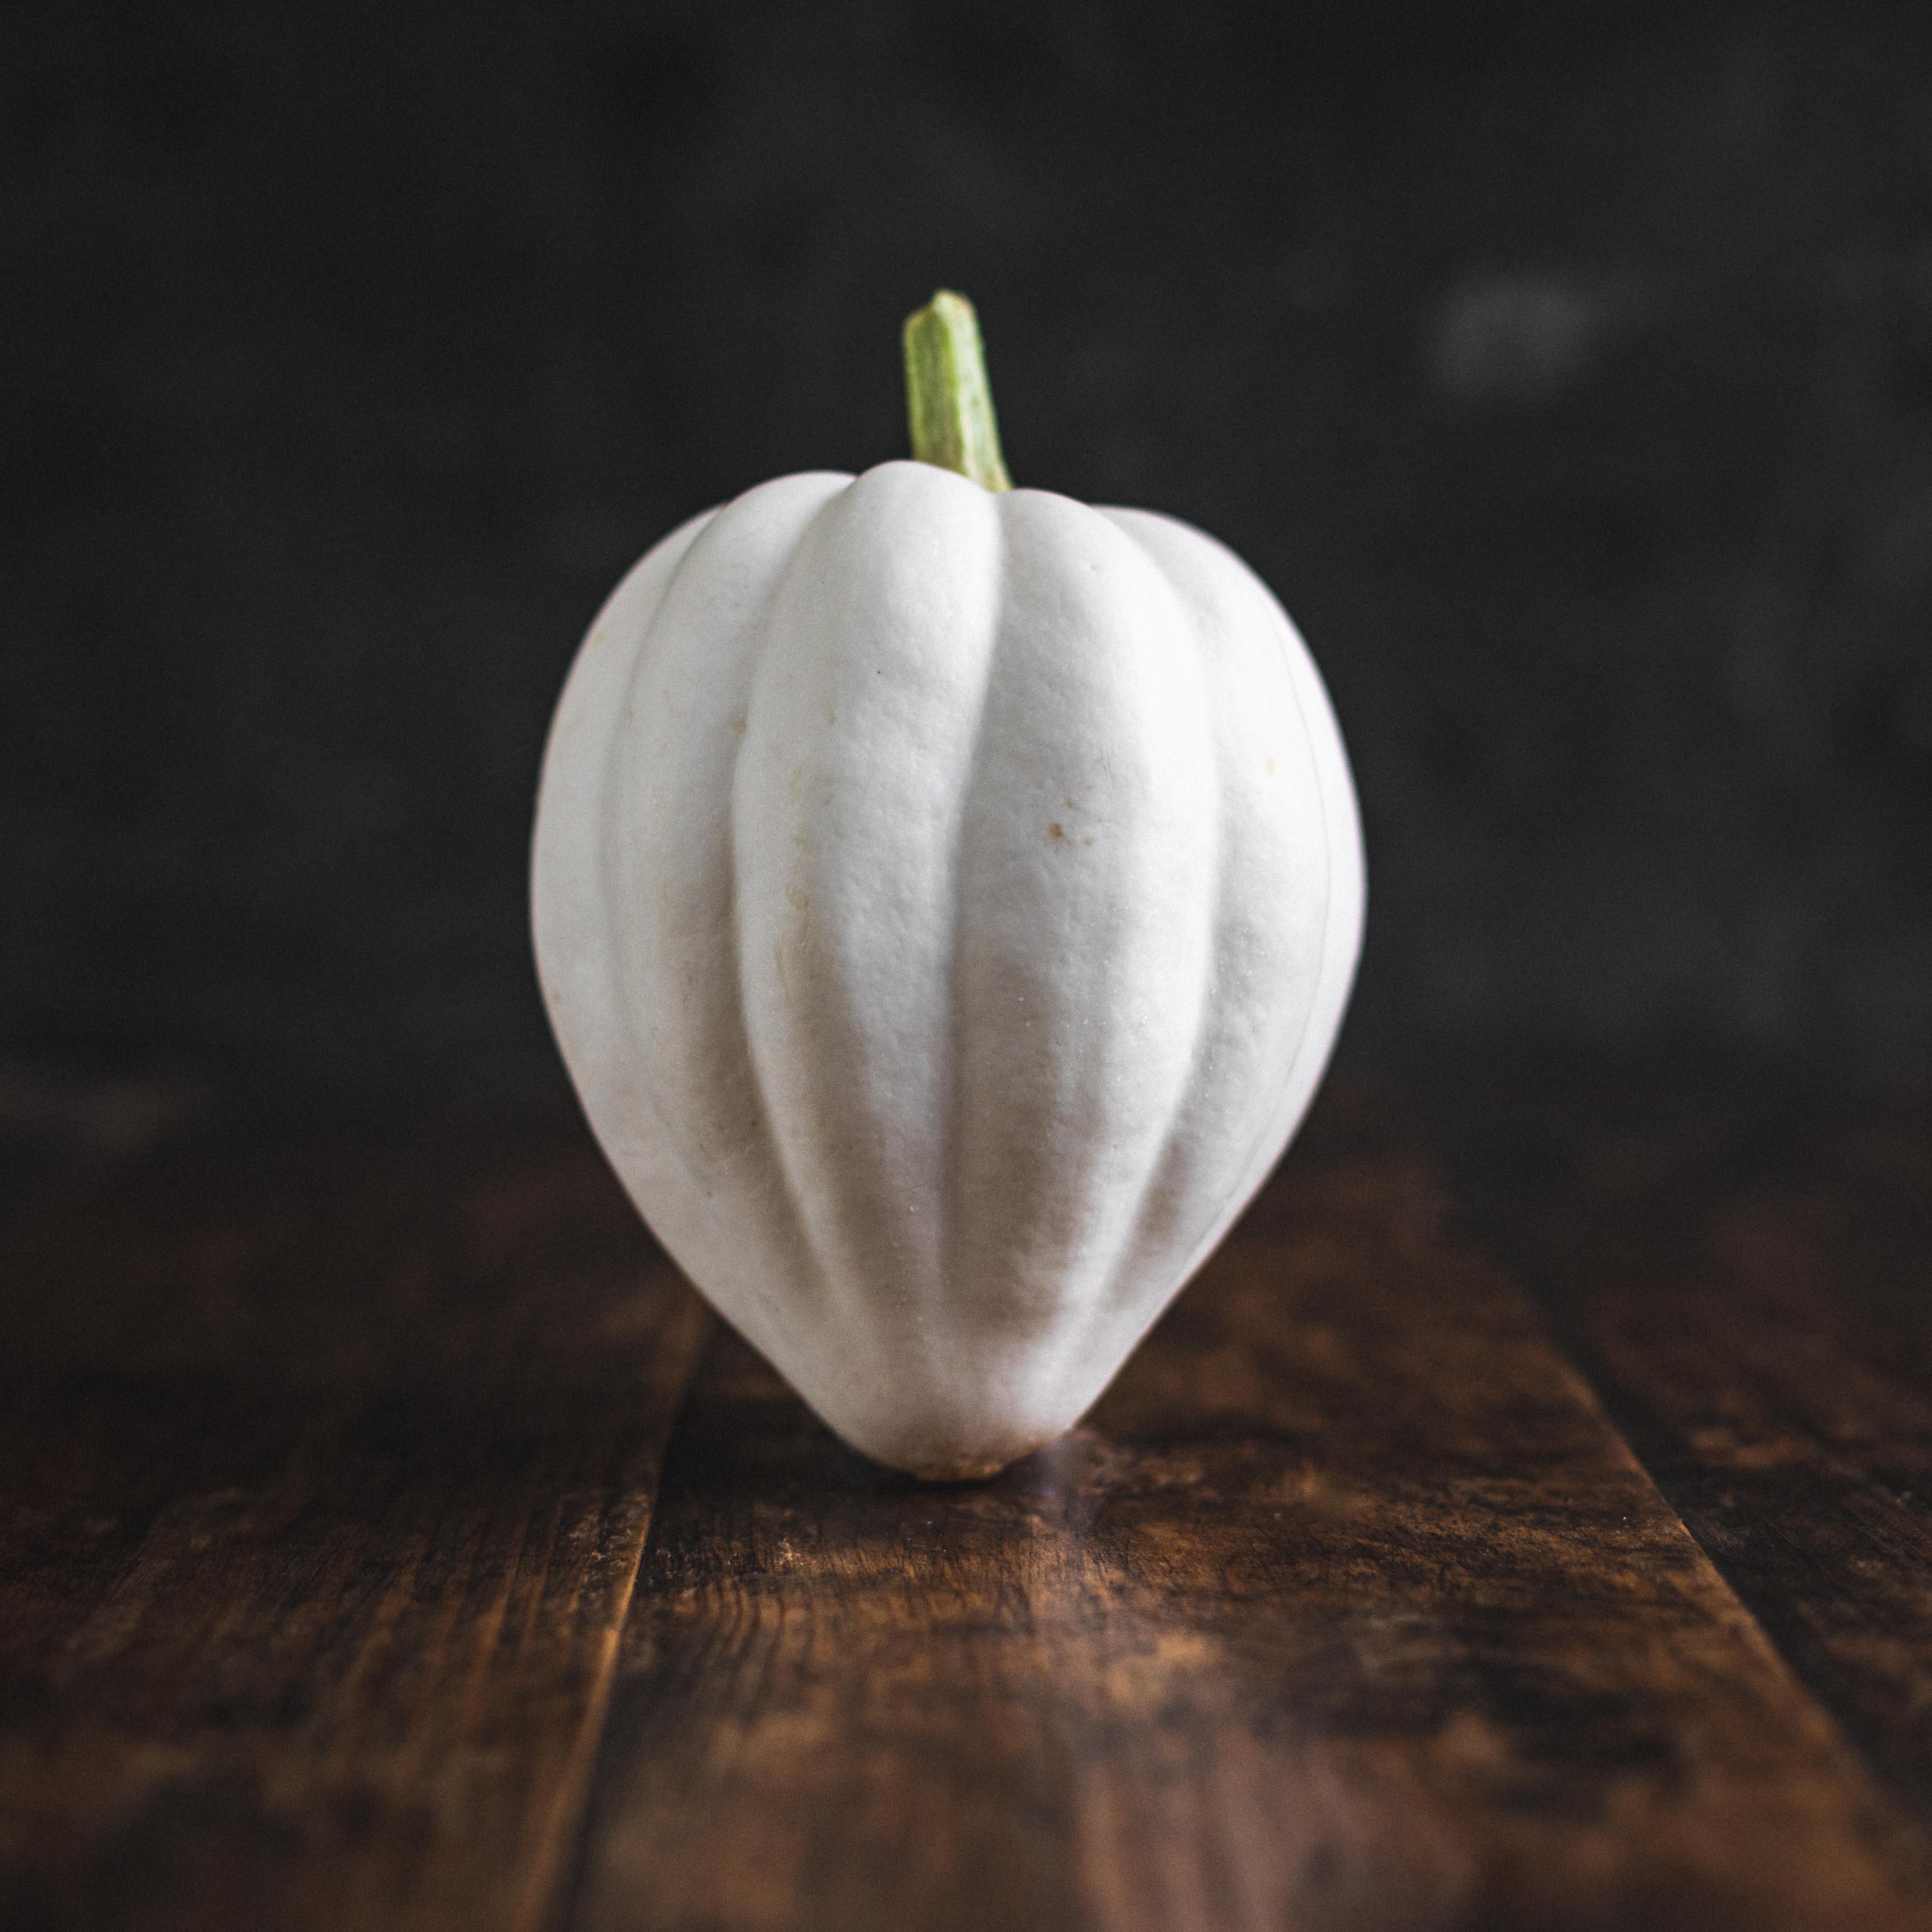 Picture of Mashed potato squash